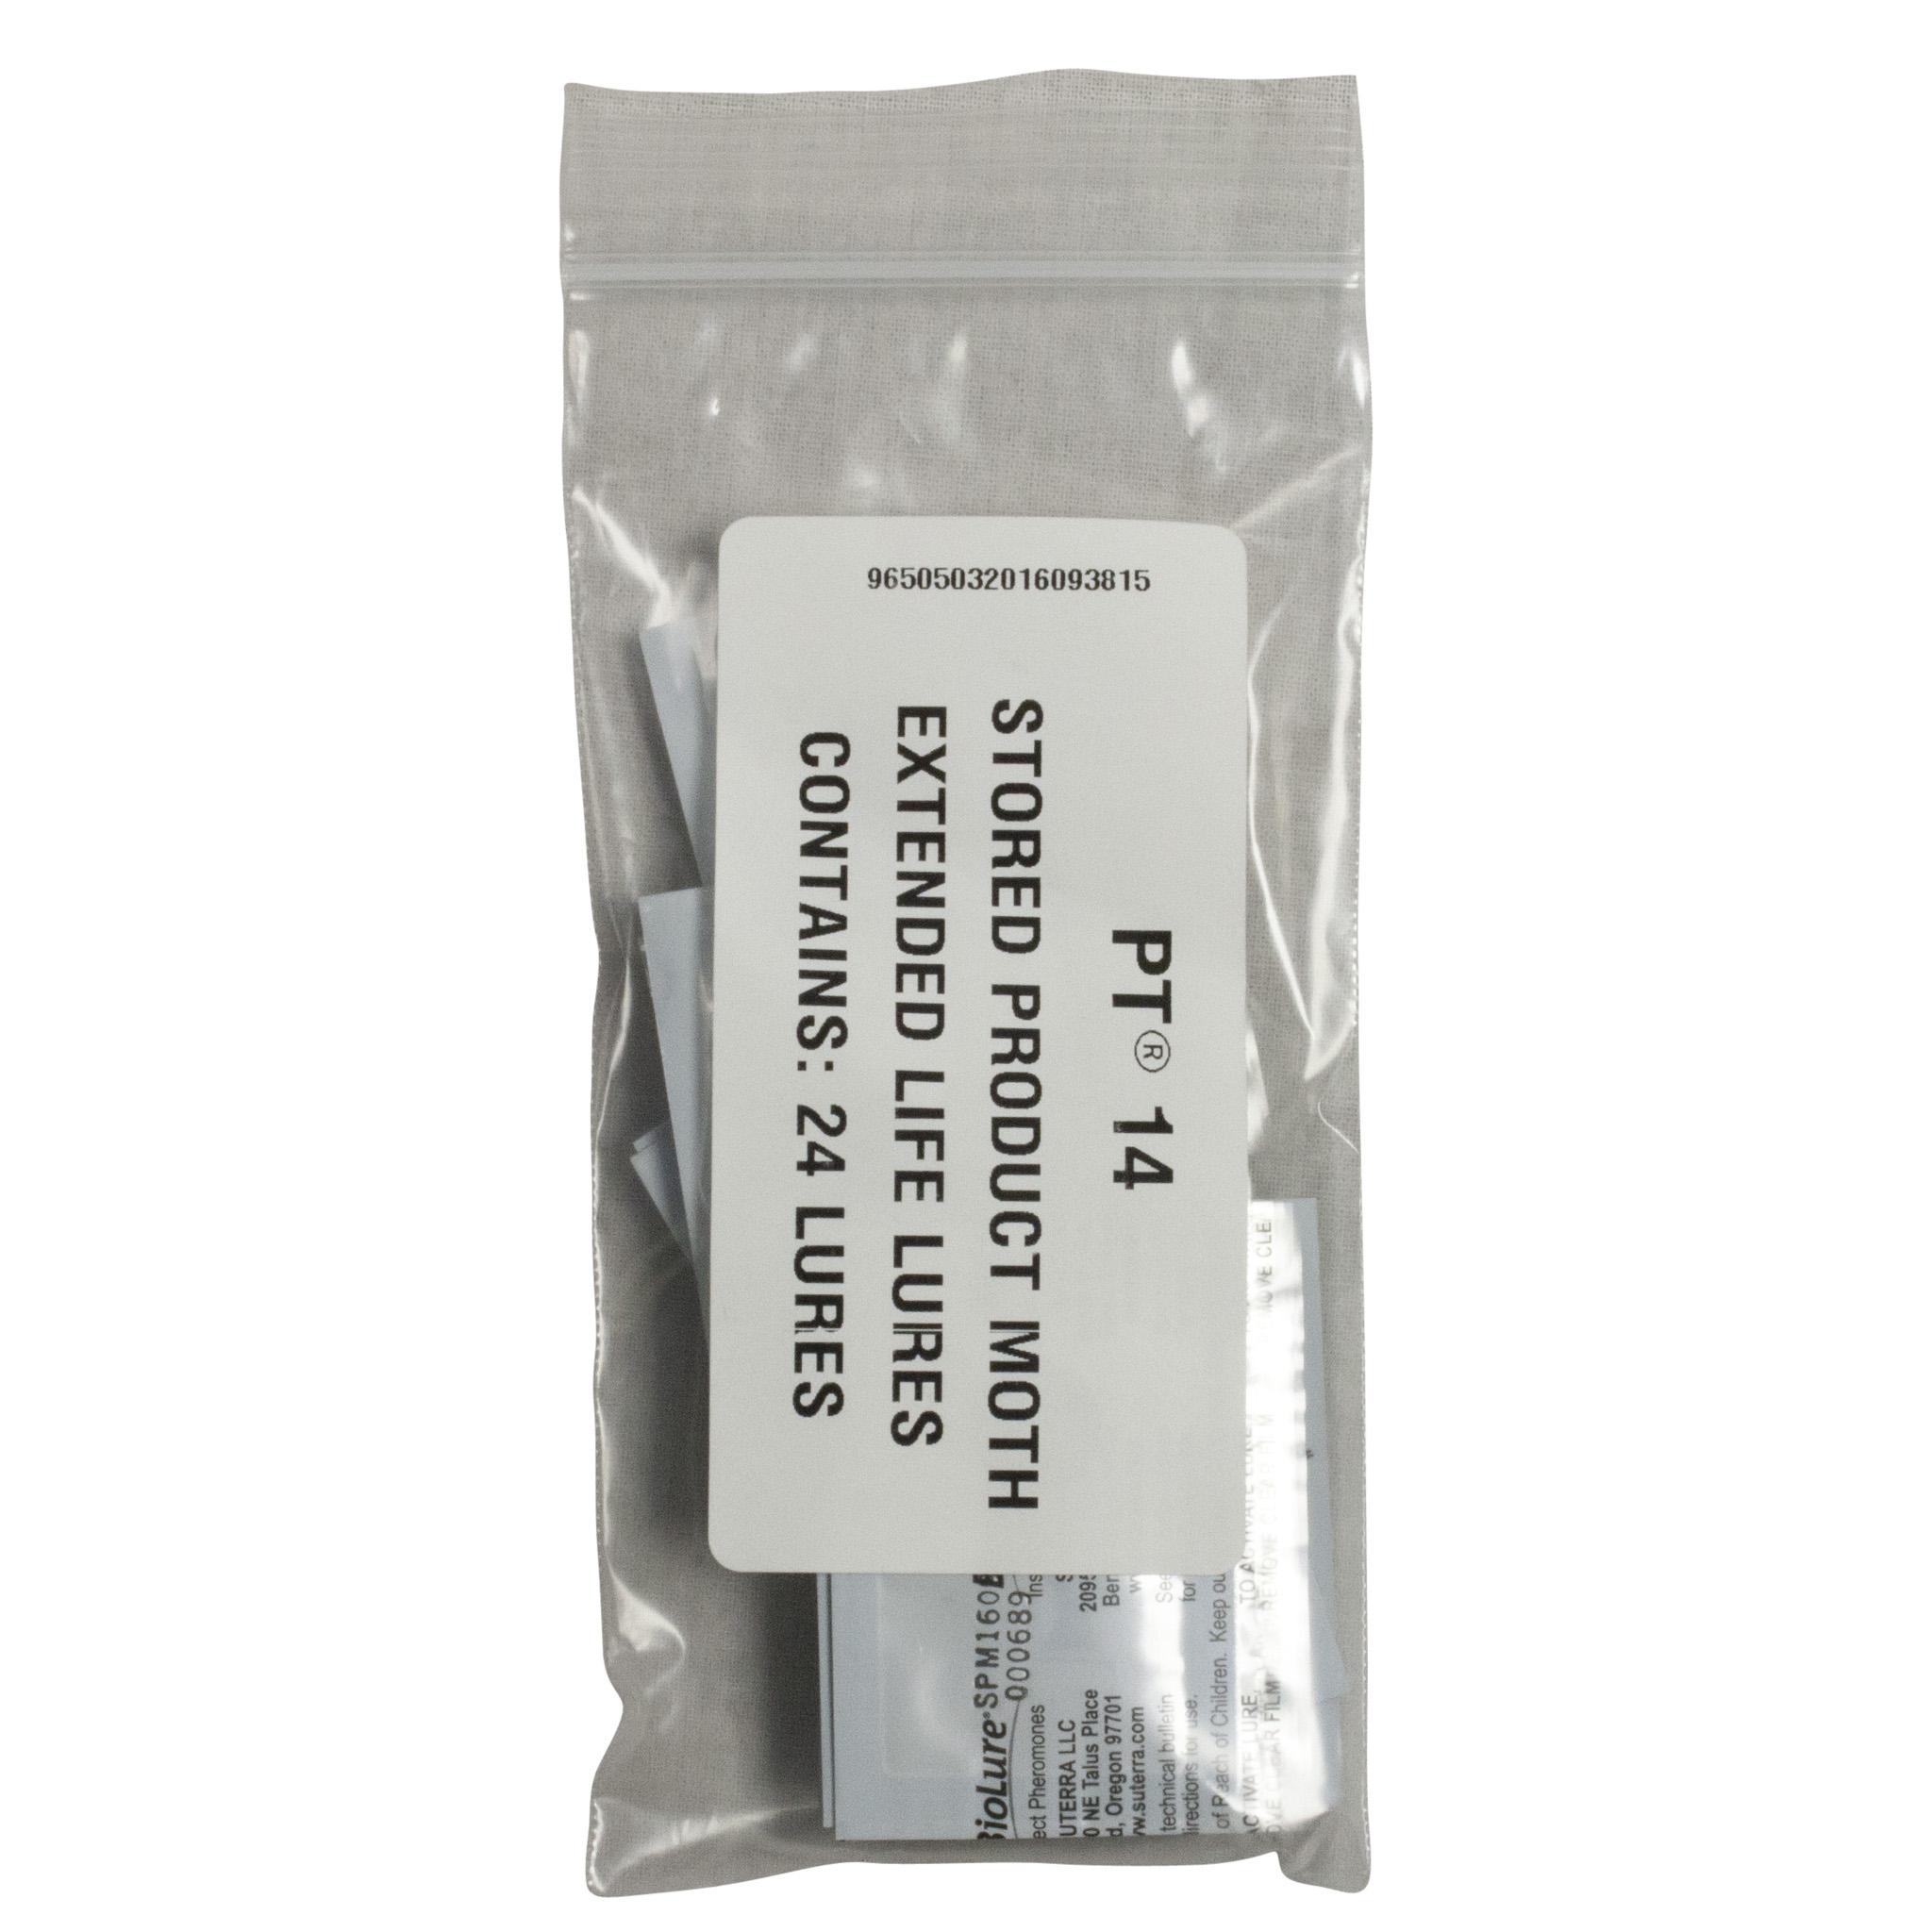 Prescription Treatment 4 Allure Moth Kit 24 Pack